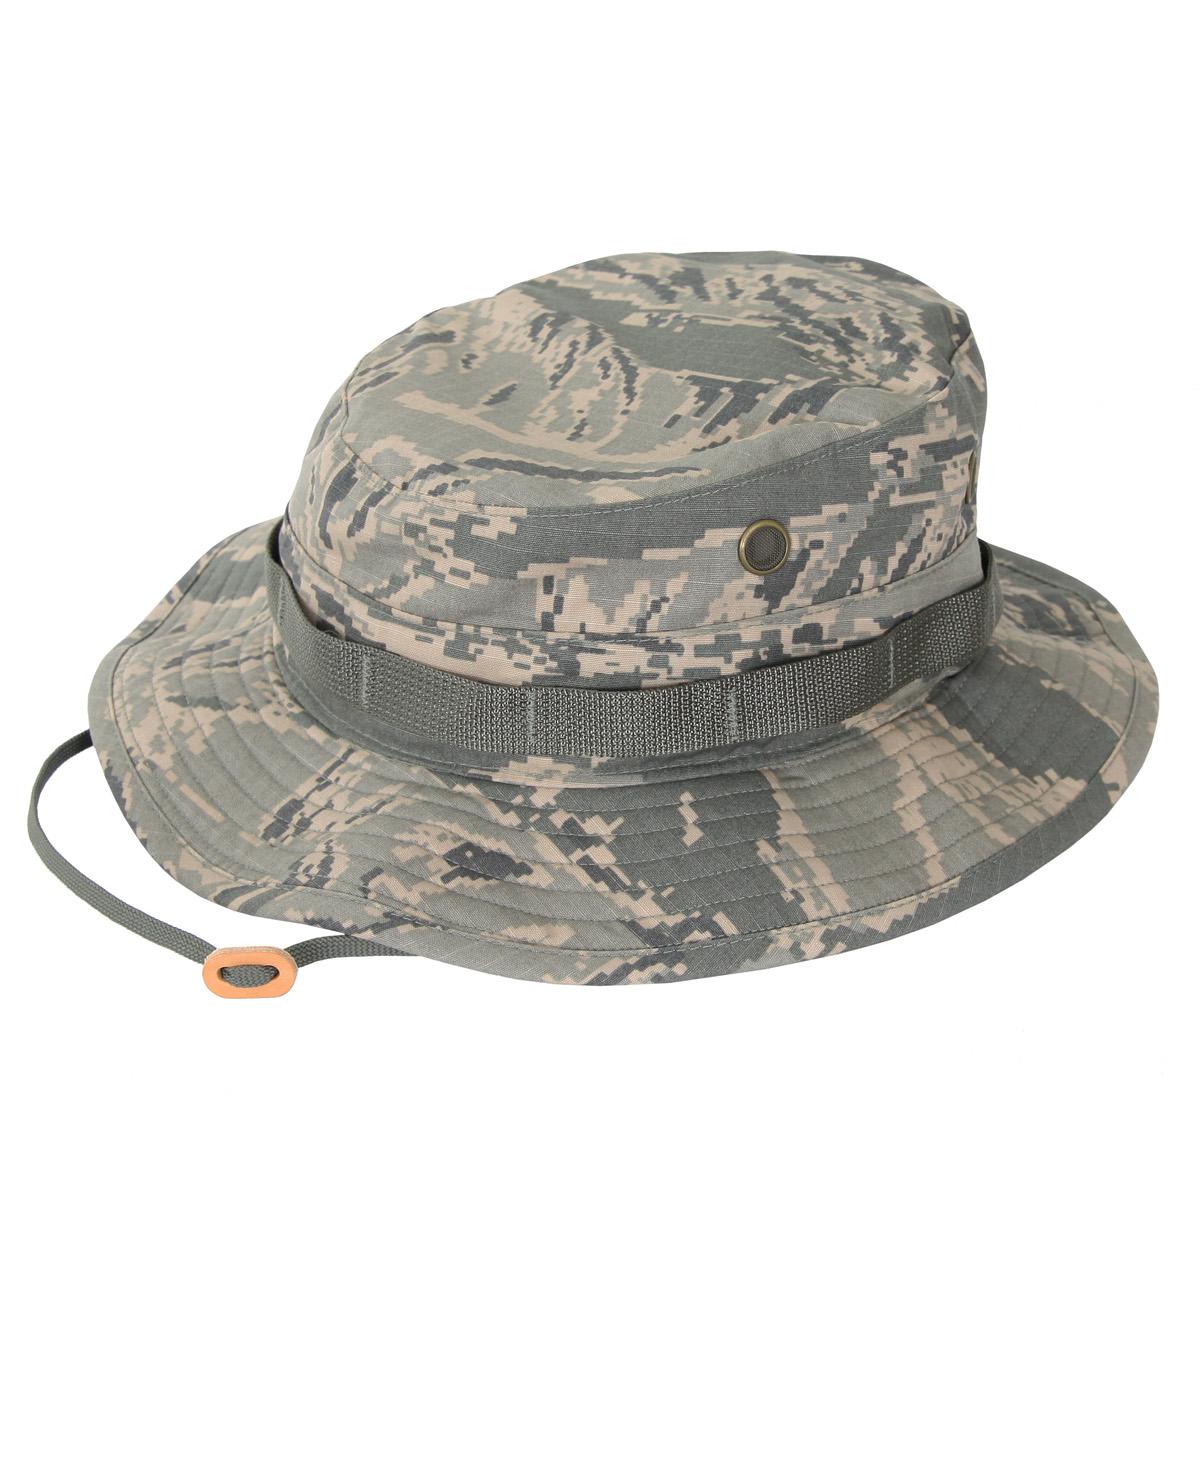 Propper F5502-21-376-XL Boonie Hat ef6d843533e